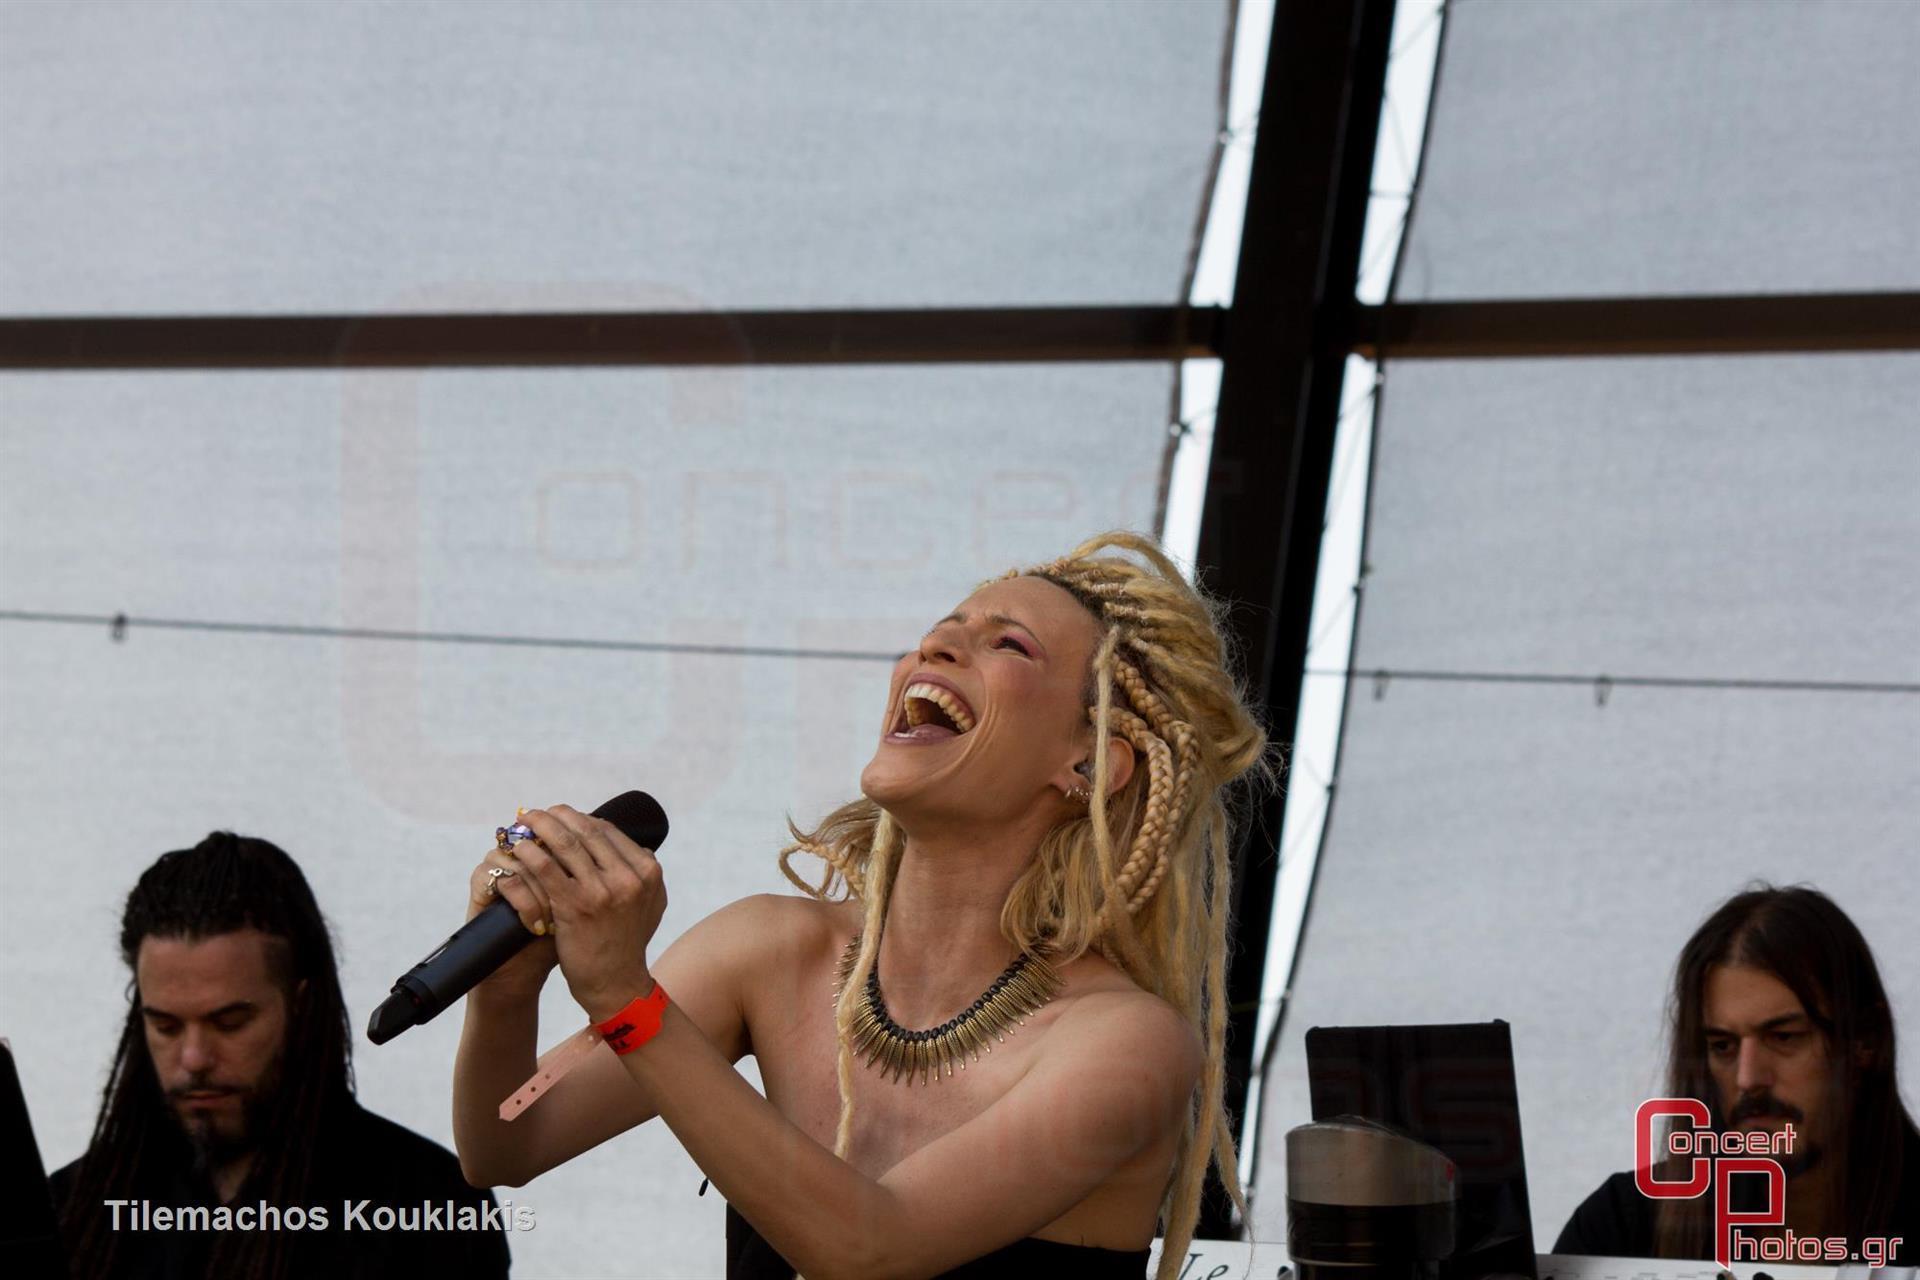 Chaostar-Chaostar photographer: Tilemachos Kouklakis - concertphotos_-0207